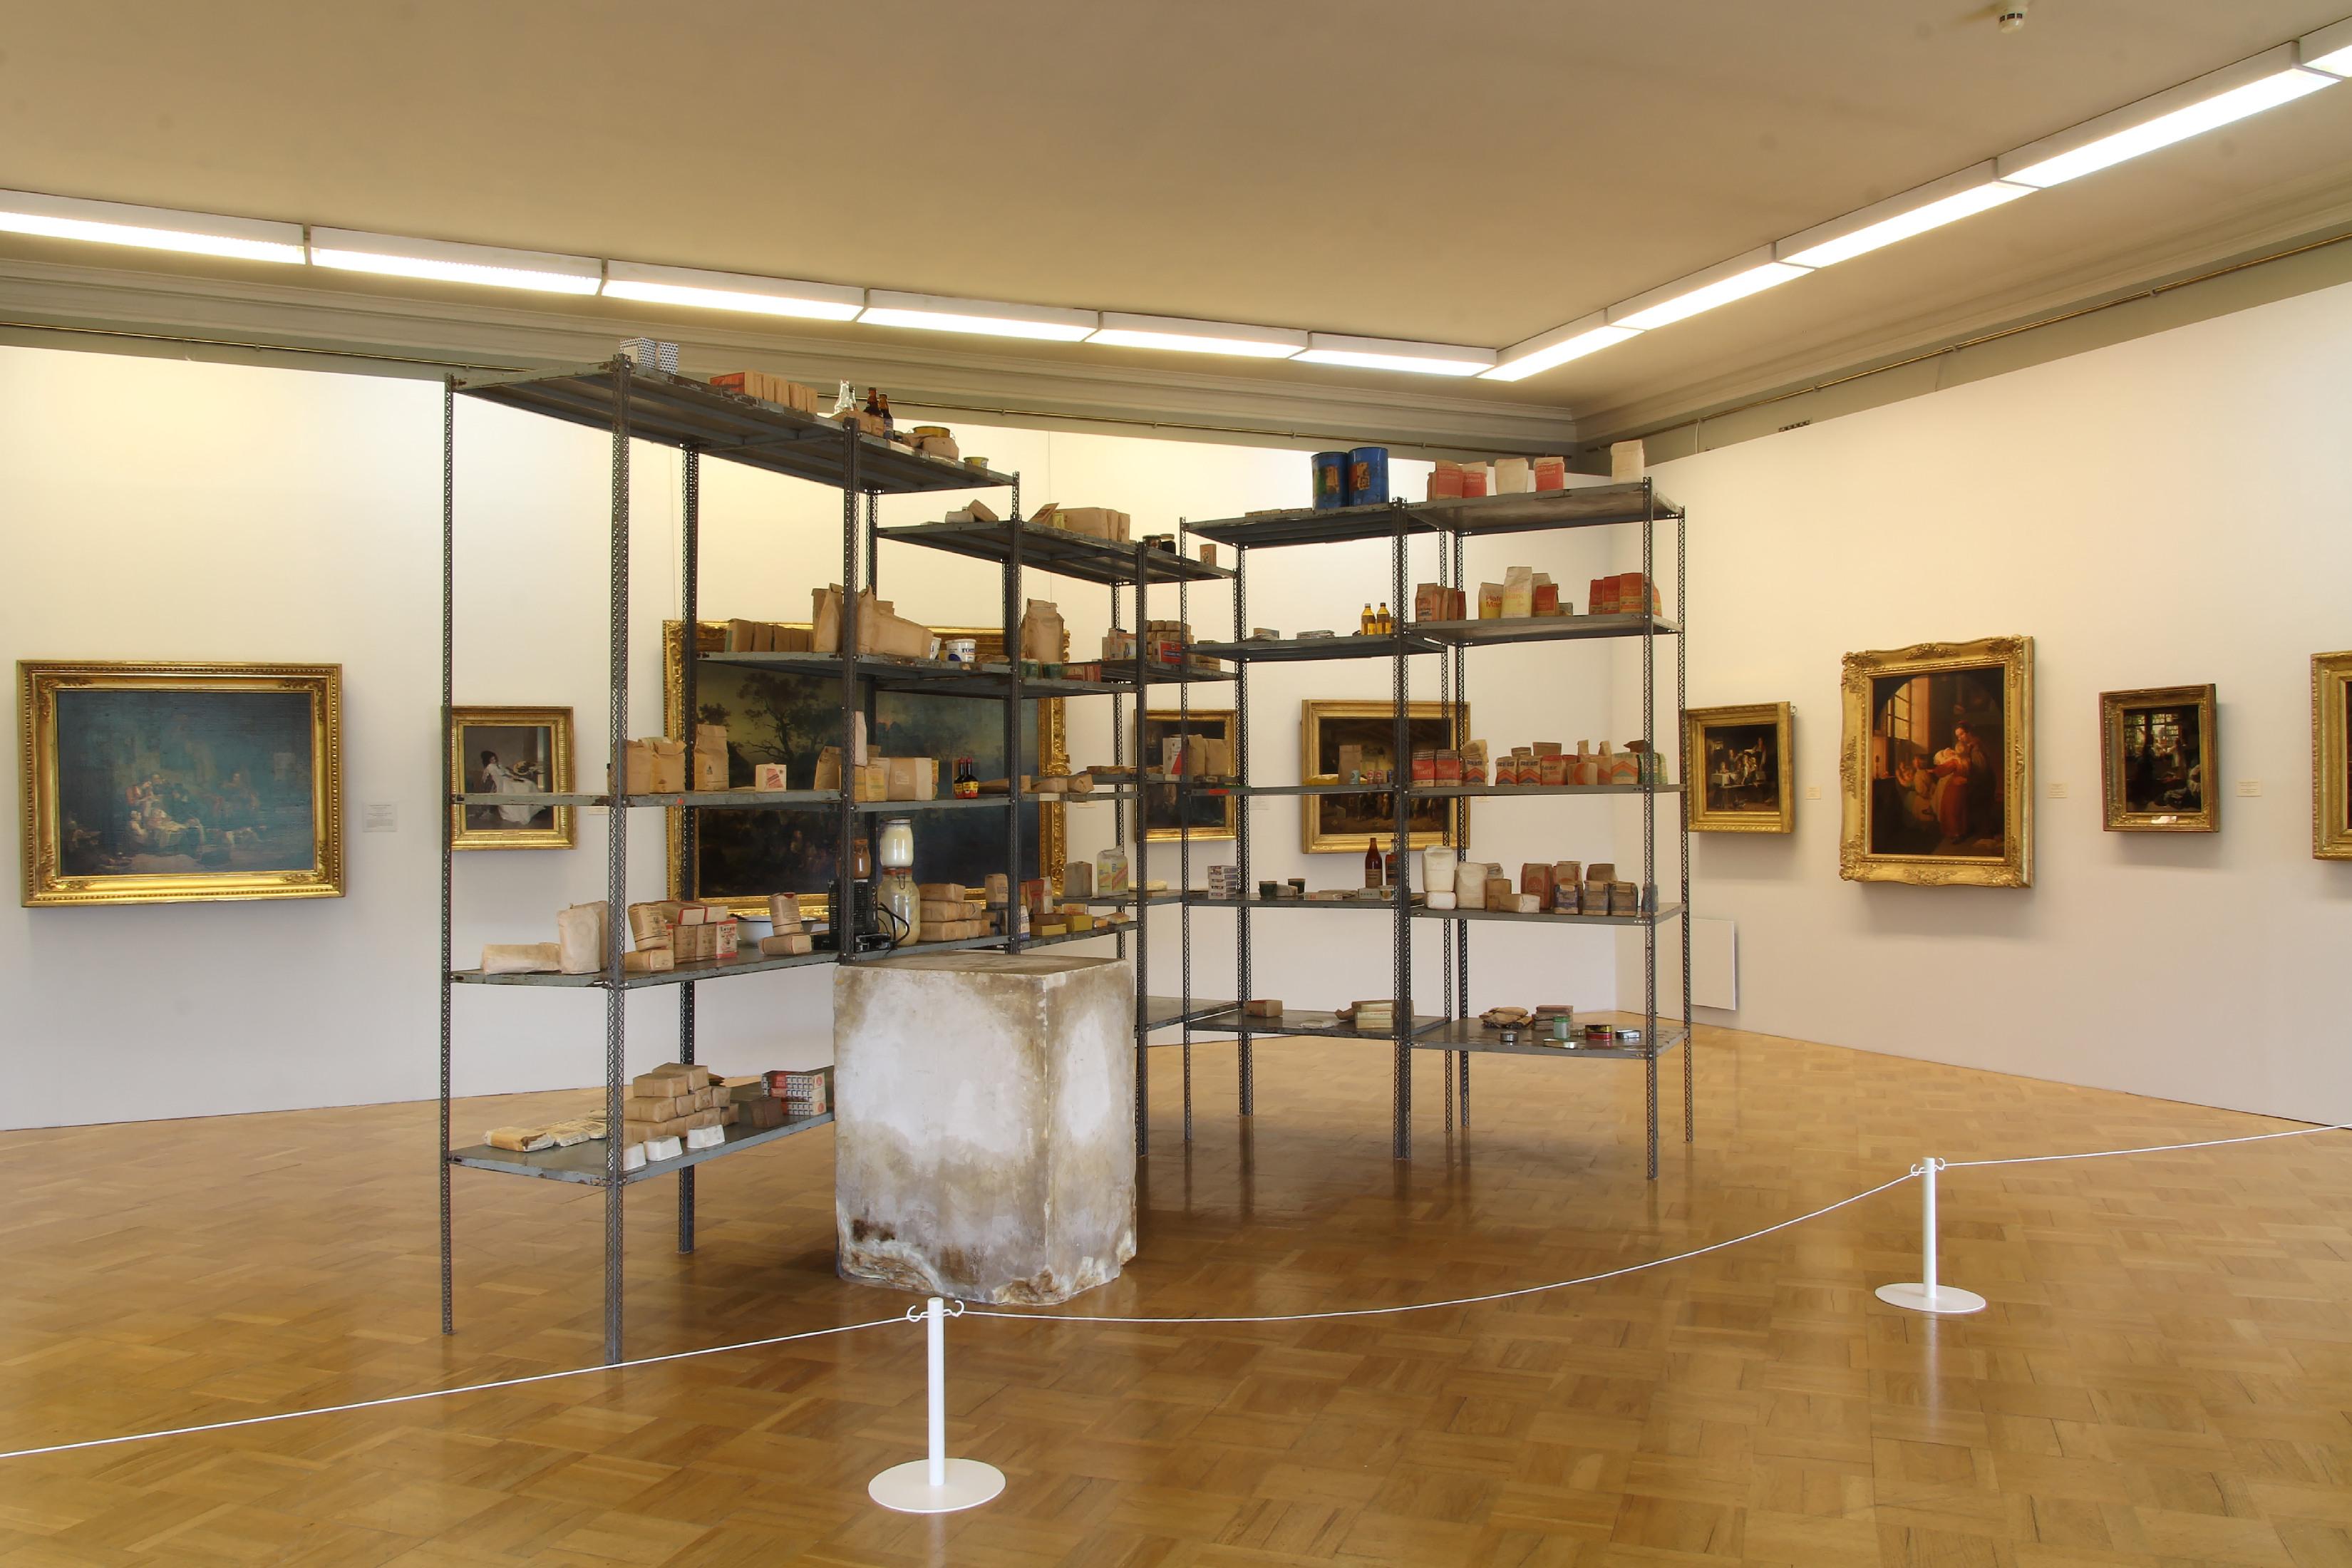 Фото: Музей S.M.A.K. Гент, Бельгия